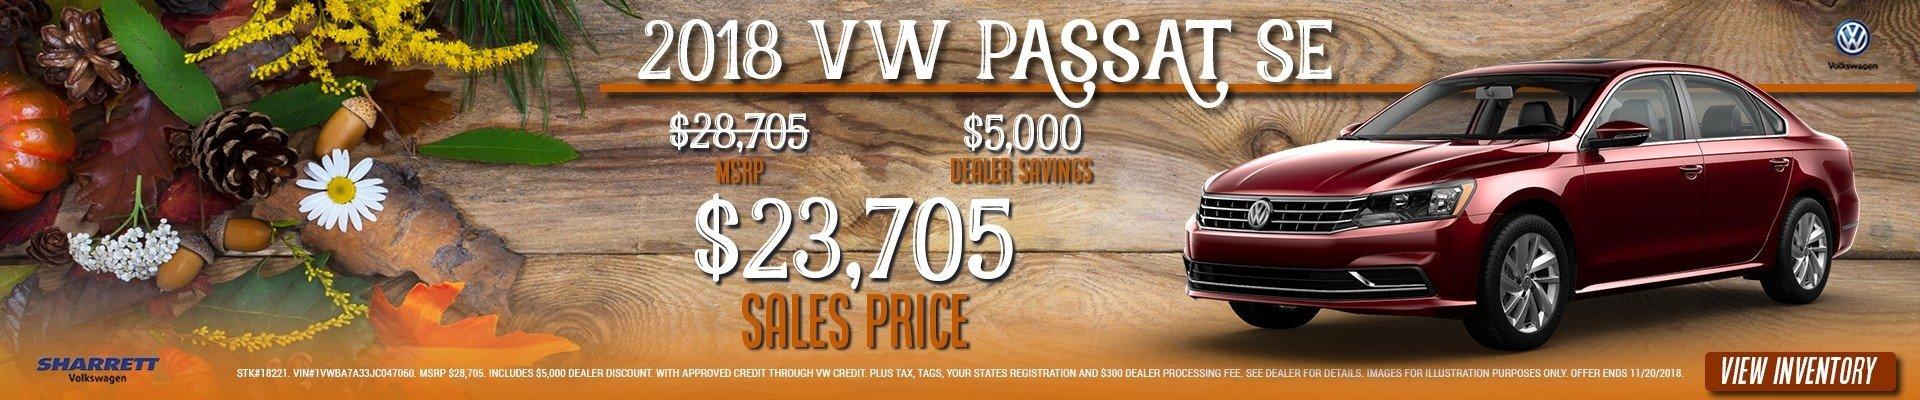 Get $5,000 off a new 2018 VW Passat –only $23,705 at Sharrett Volkswagen